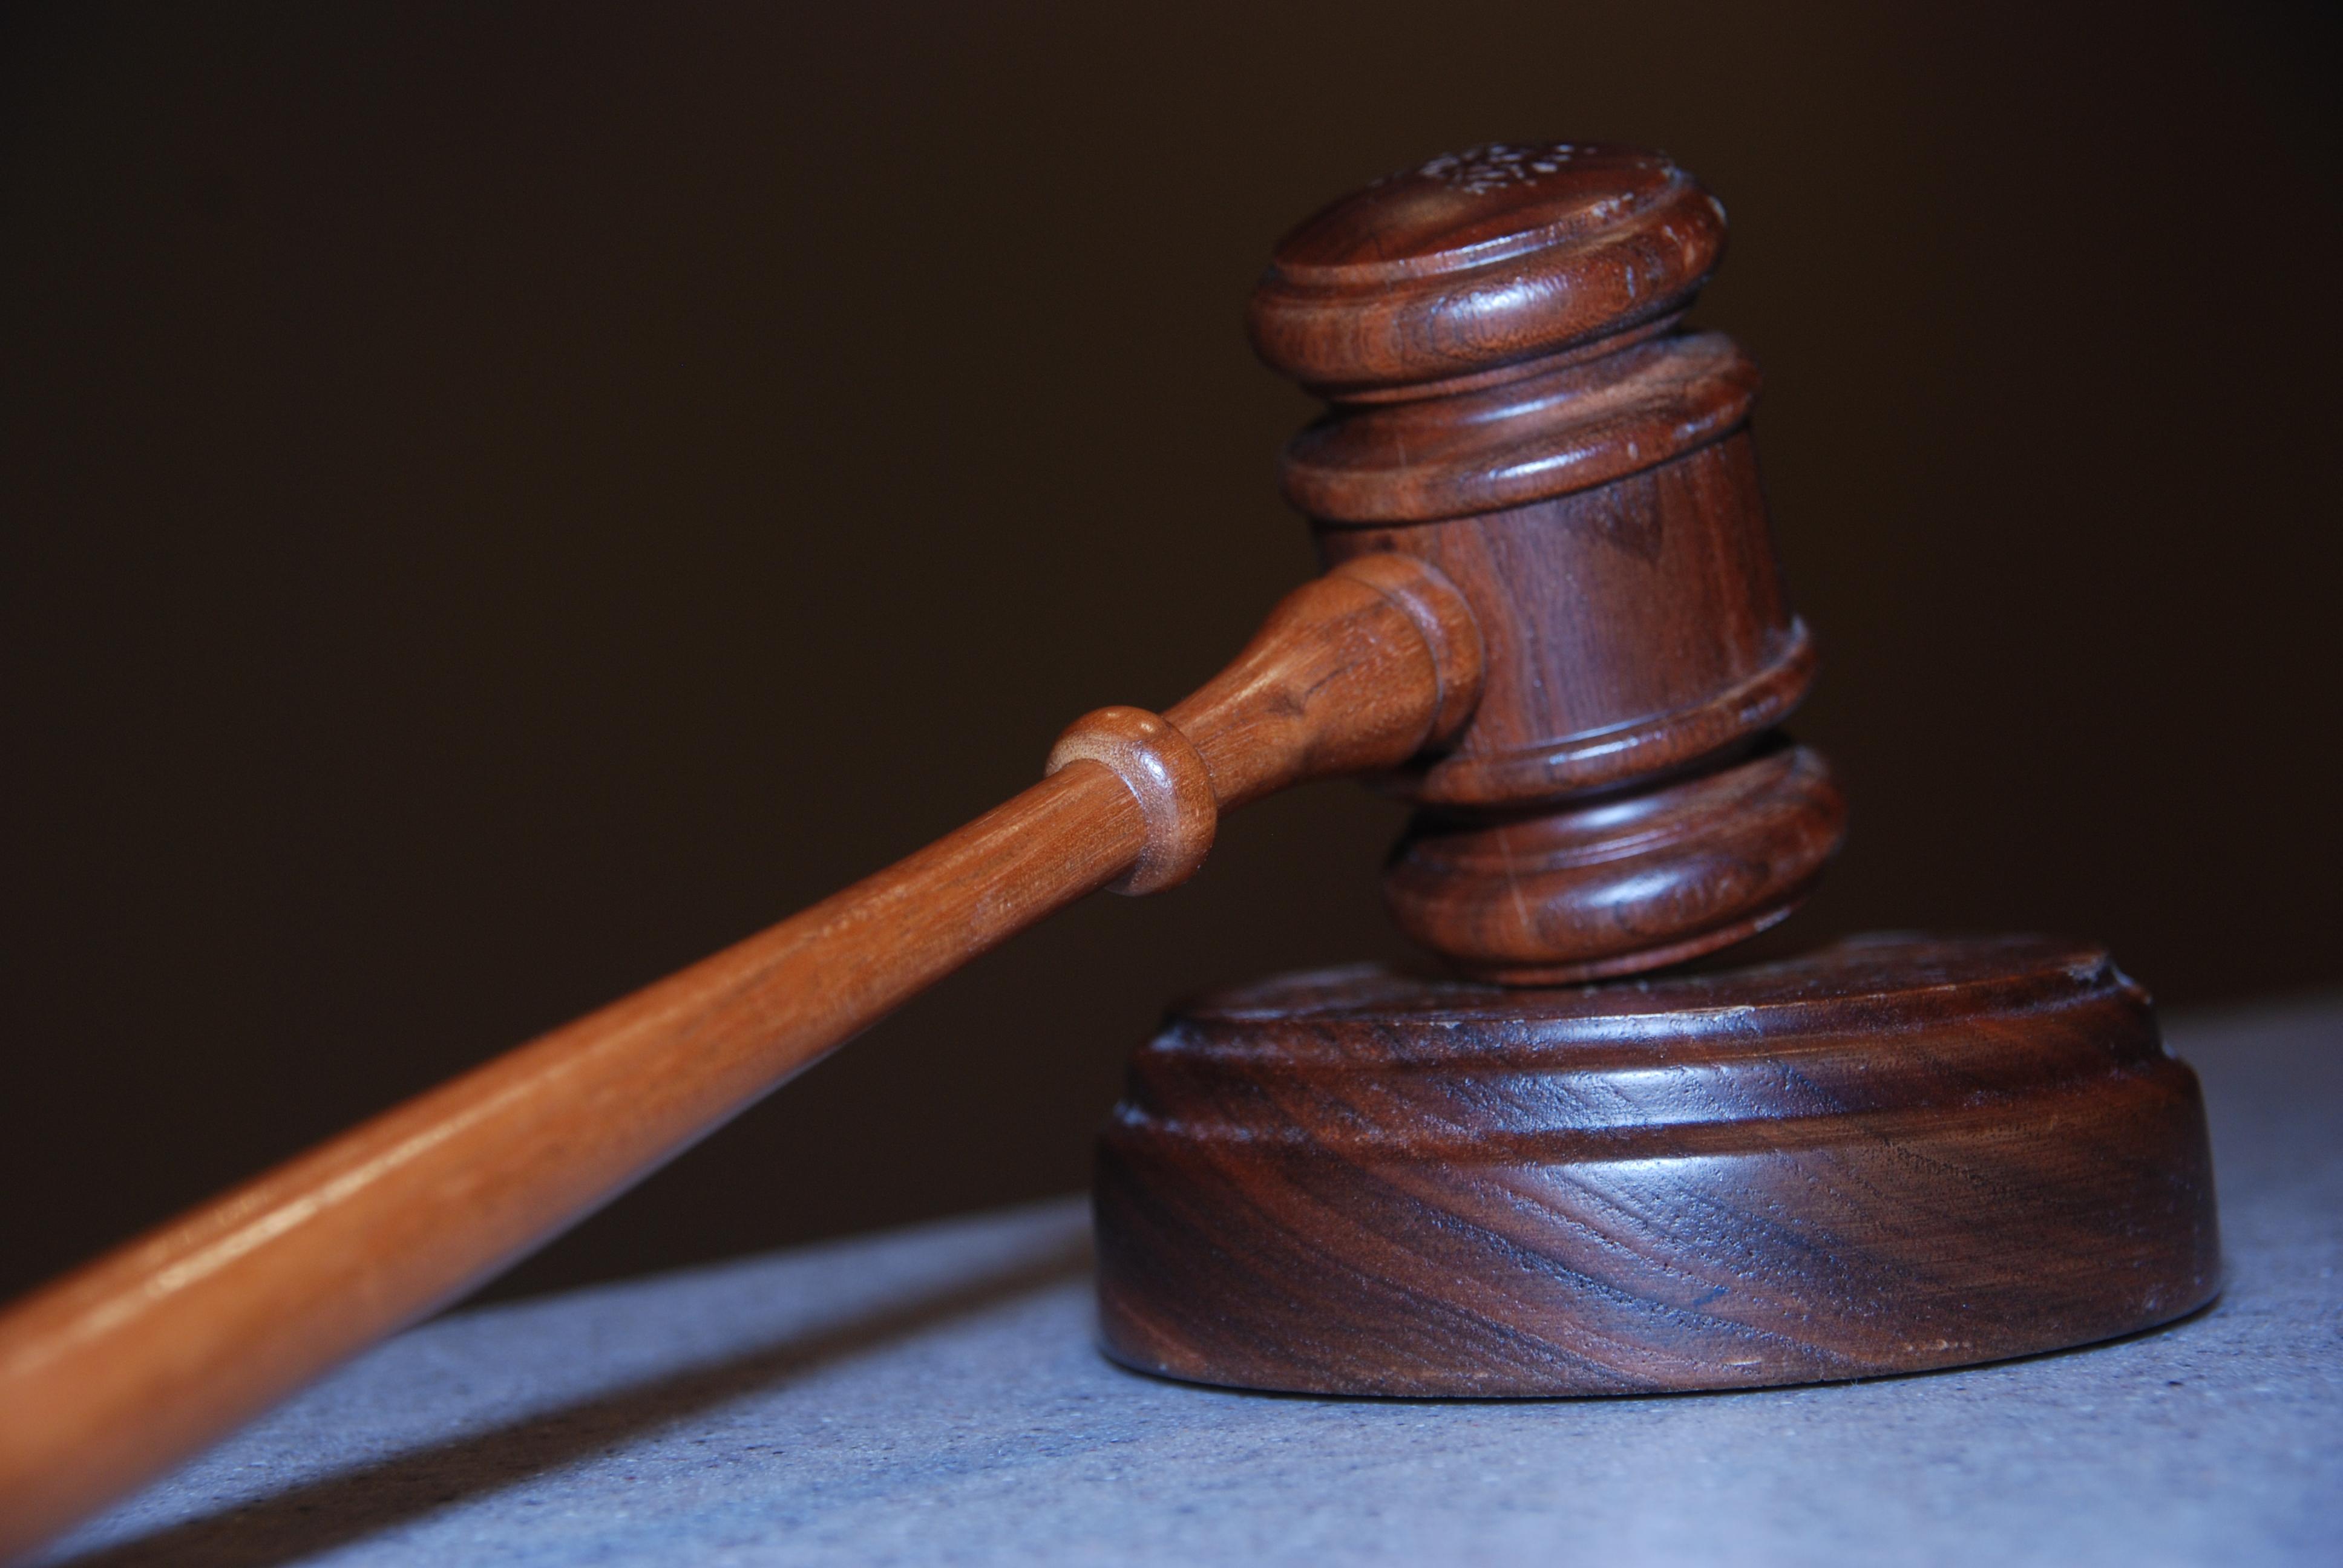 Bulgaria's judiciary faces funding shortage – reports